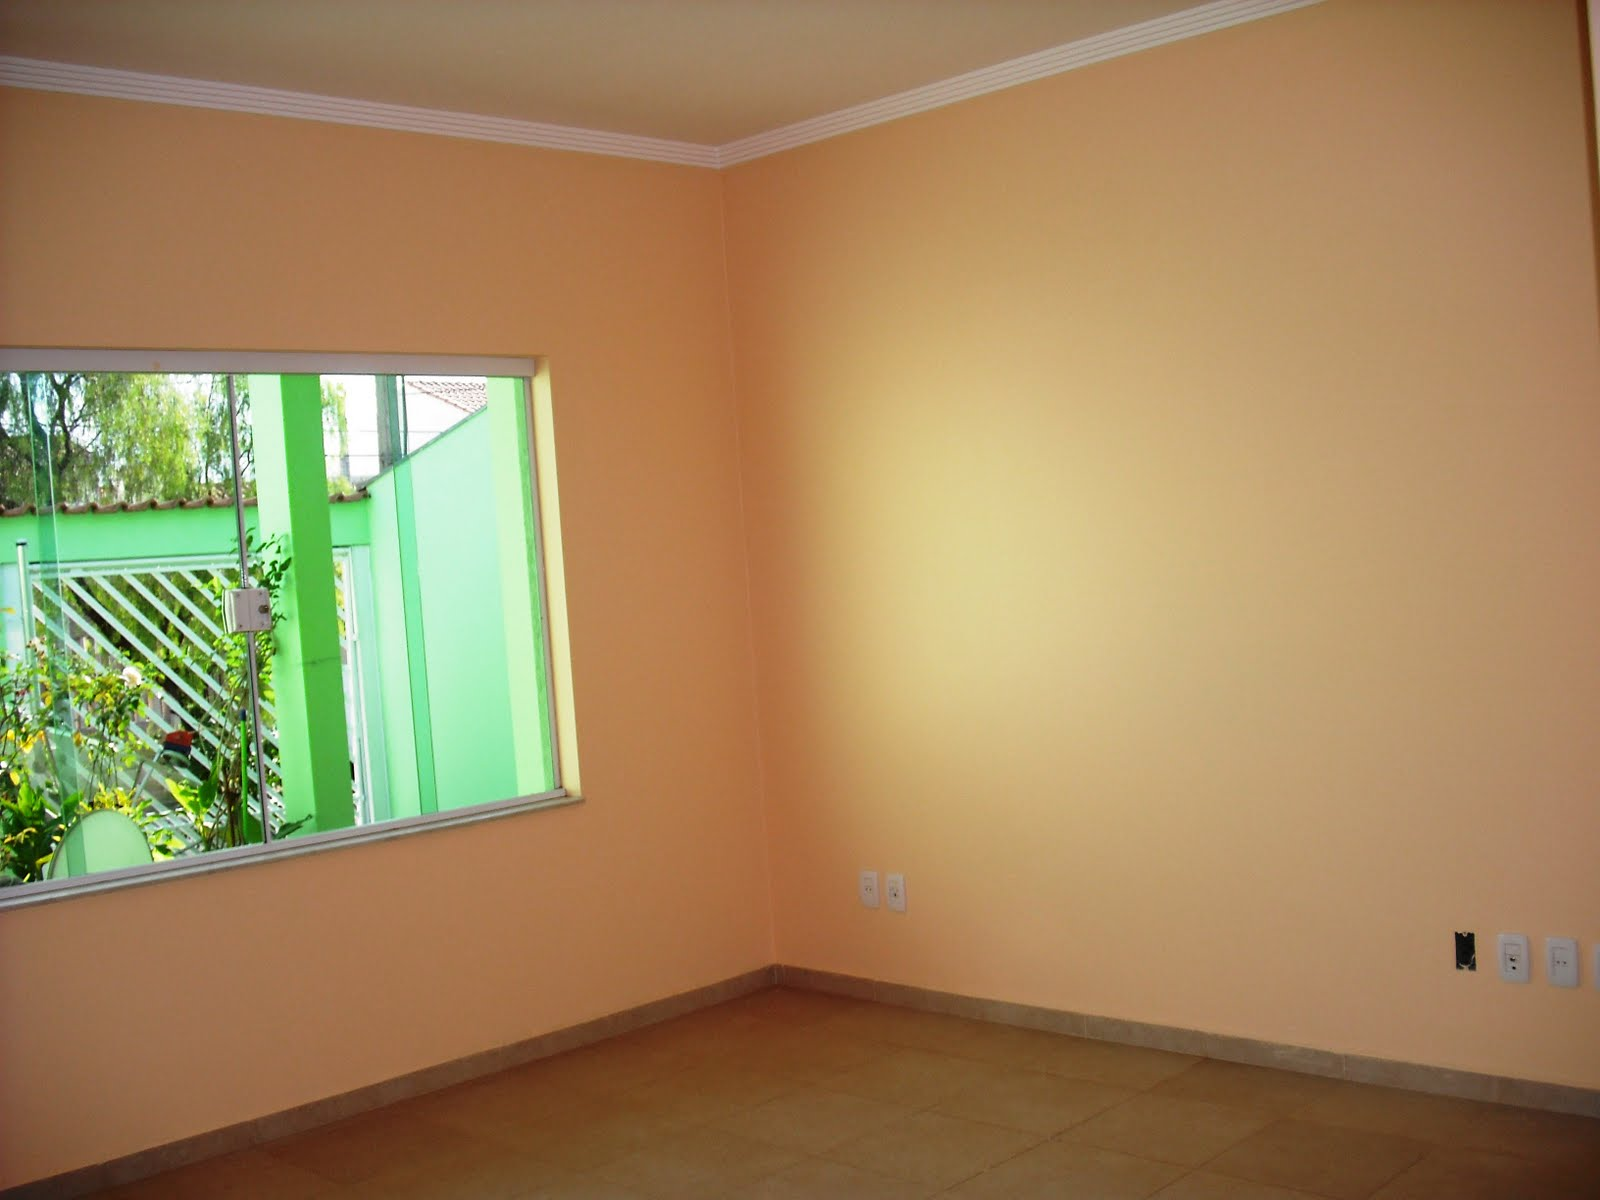 #2C9F57 DE NEGÓCIOS: Sala Piso porcelanato 3 ambs janela de vidro  434 Janelas De Vidros Para Salas